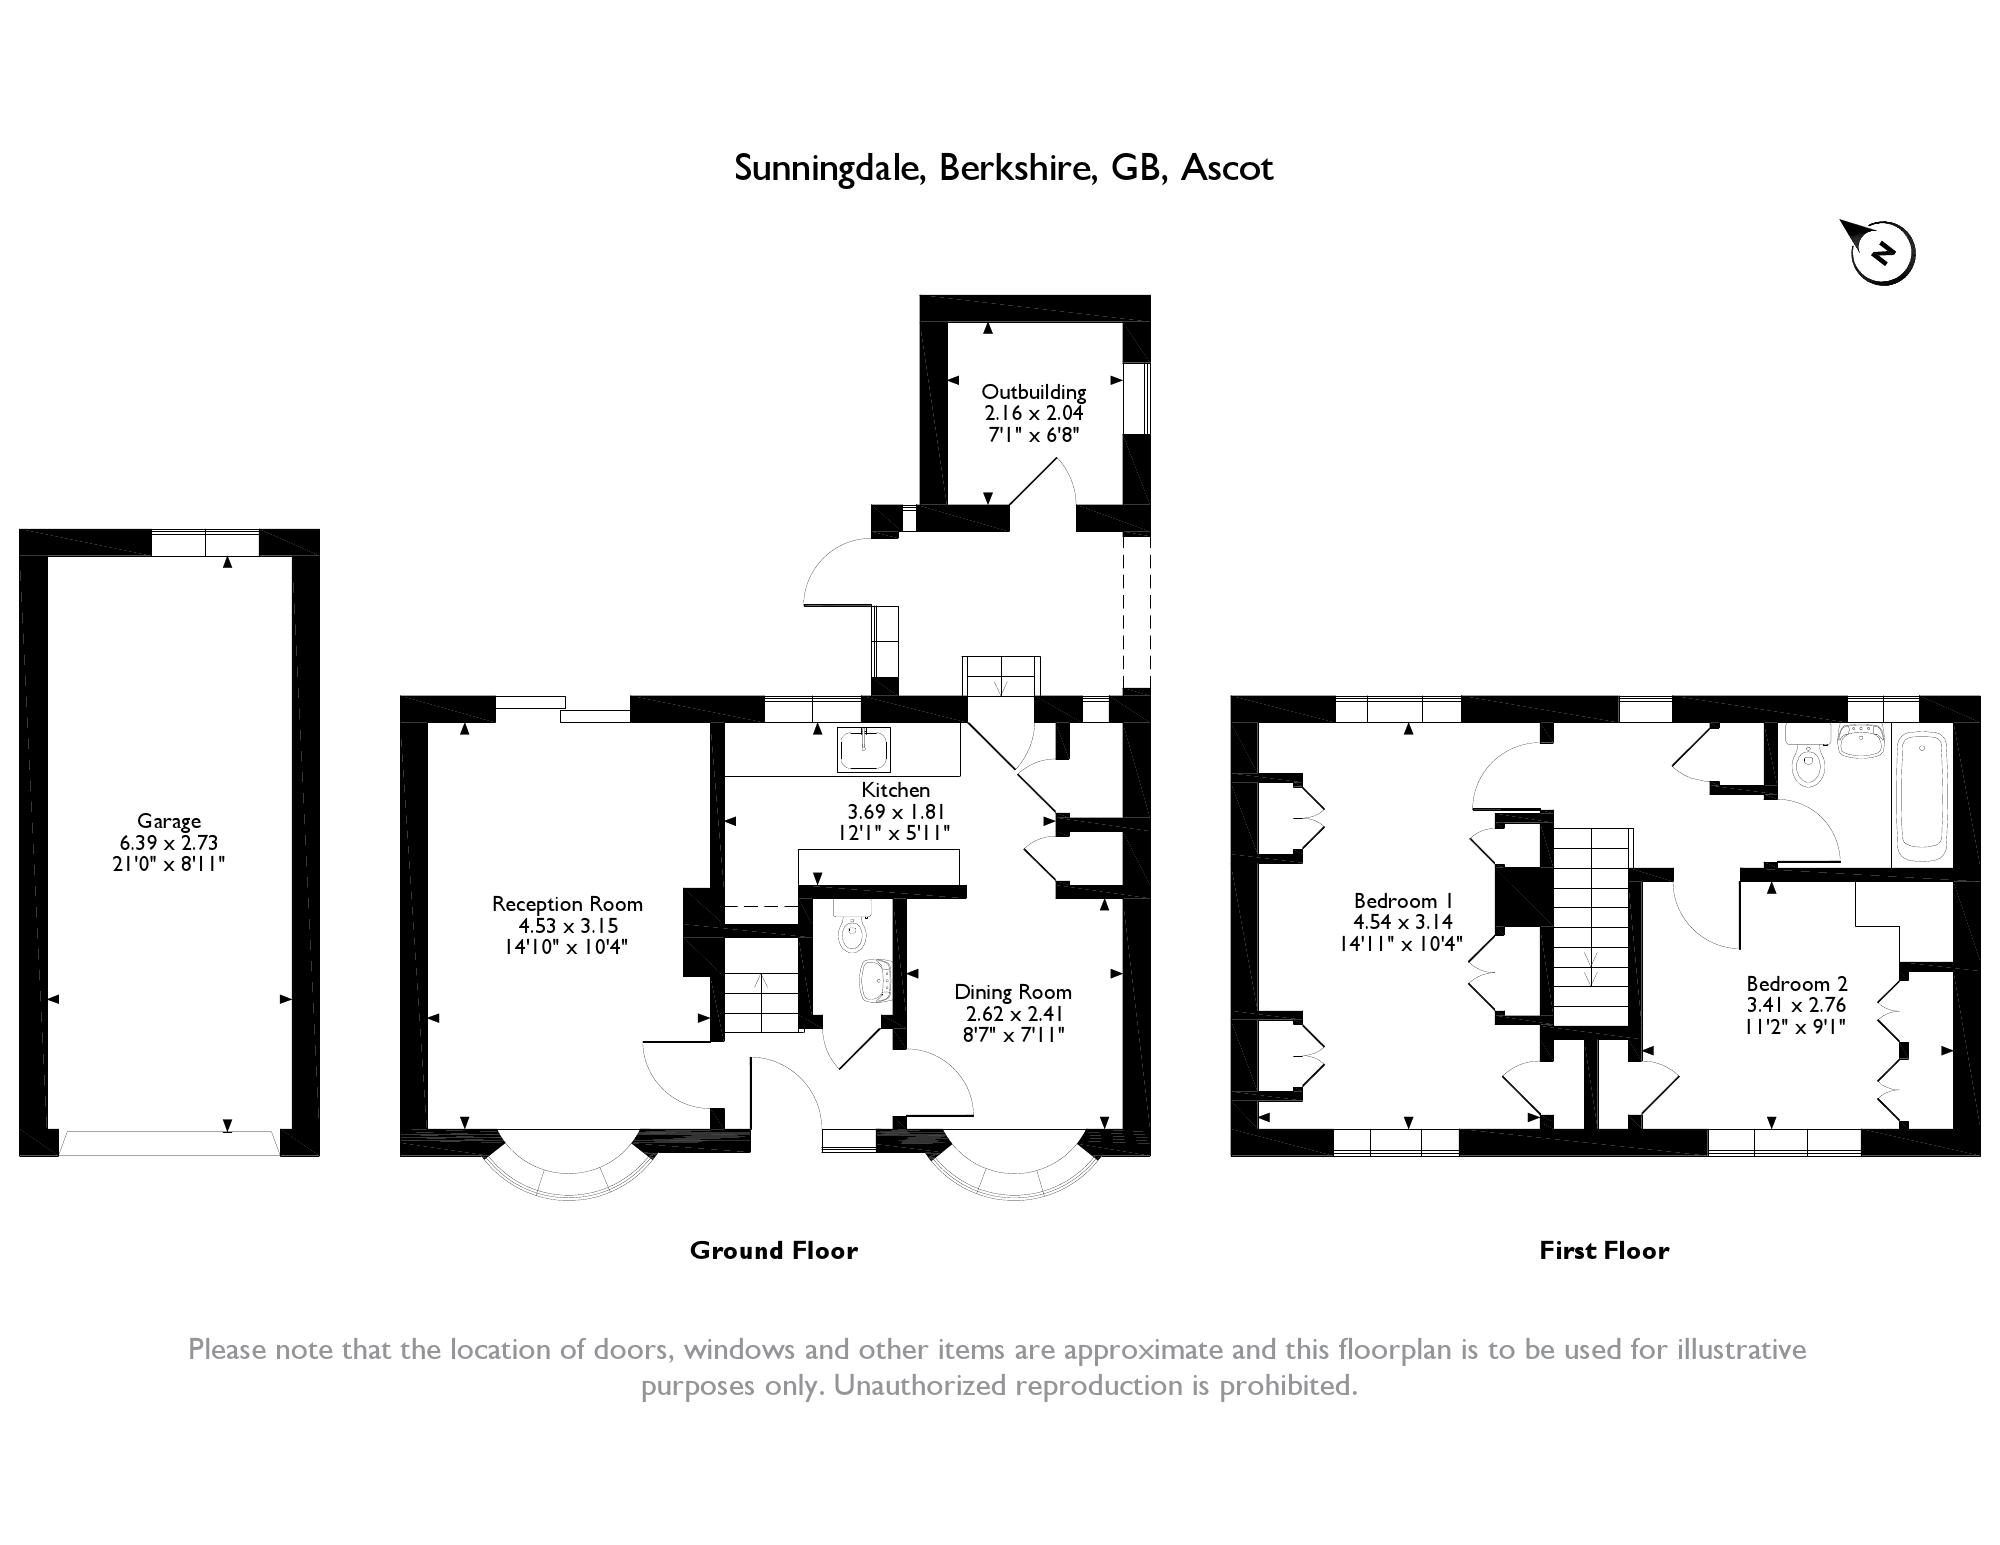 Park Drive Sunningdale Ascot Berkshire Sl5 2 Bedroom